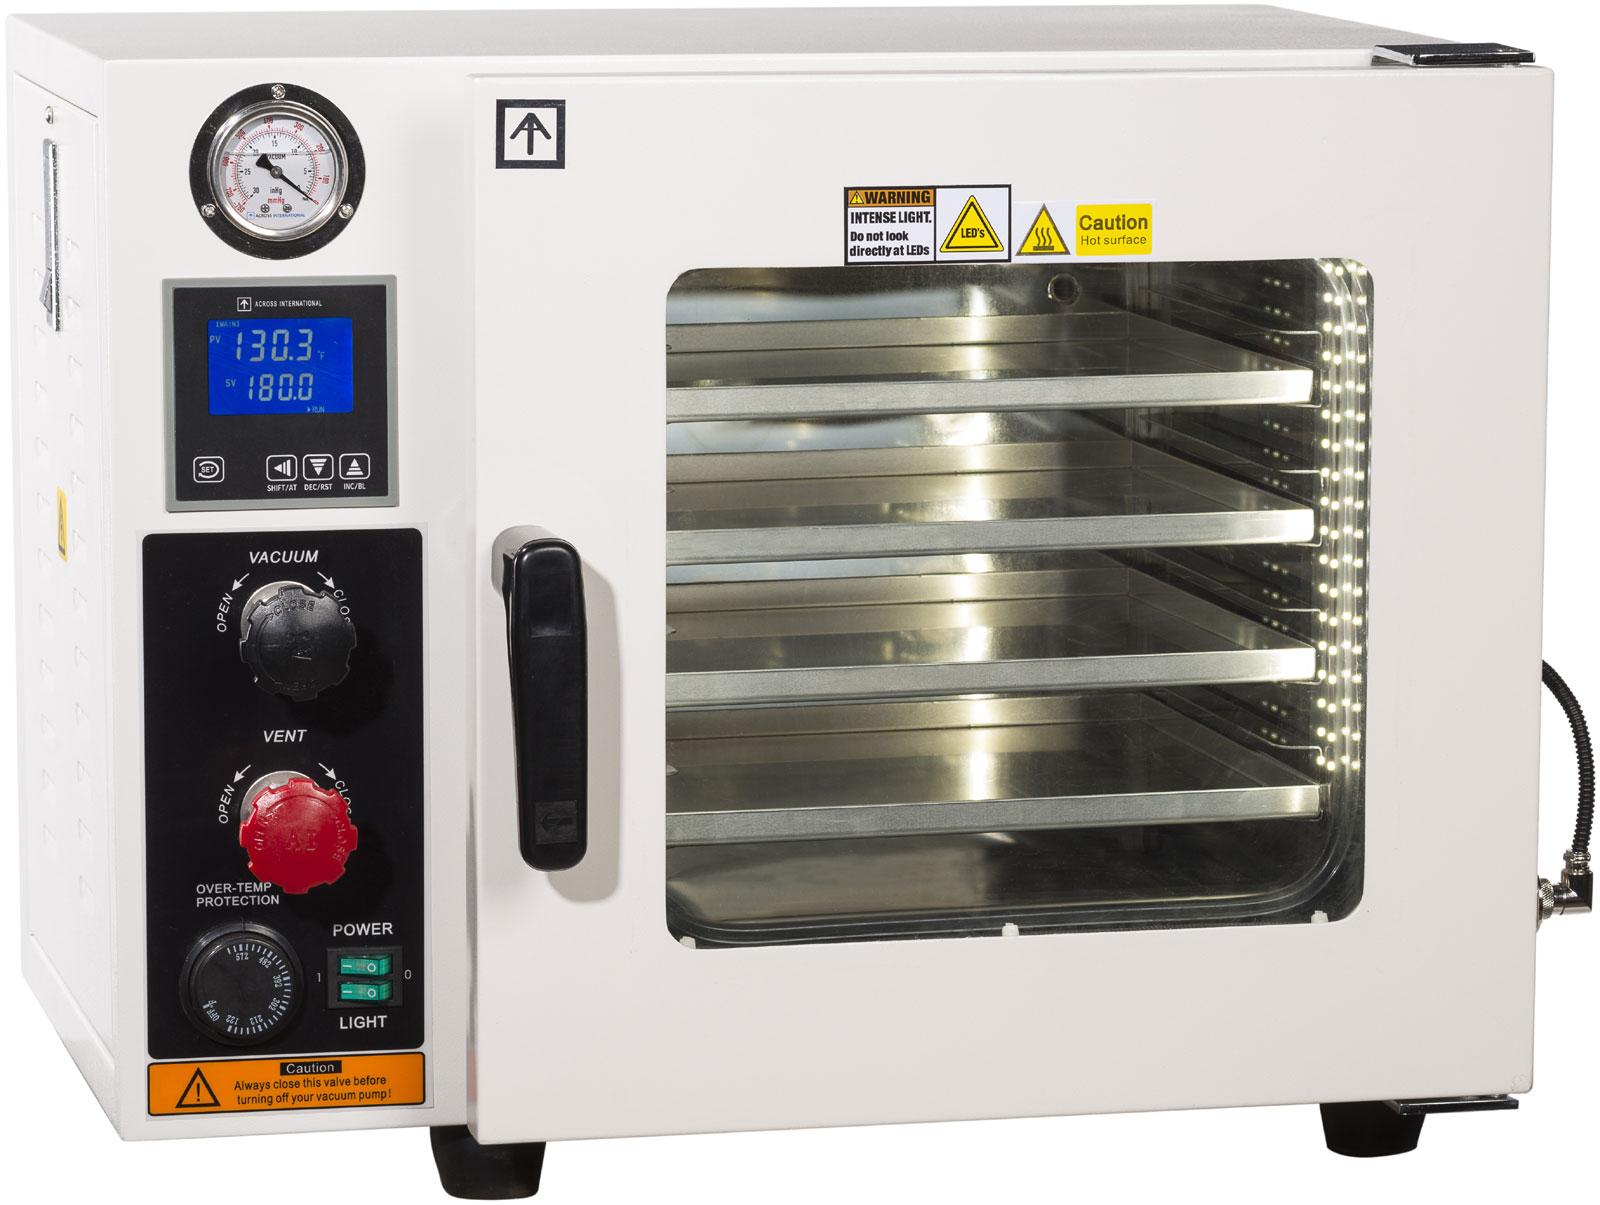 Ulcsa Certified 09 Cf Vacuum Oven 5 Sided Heat Sst Tubingvalves